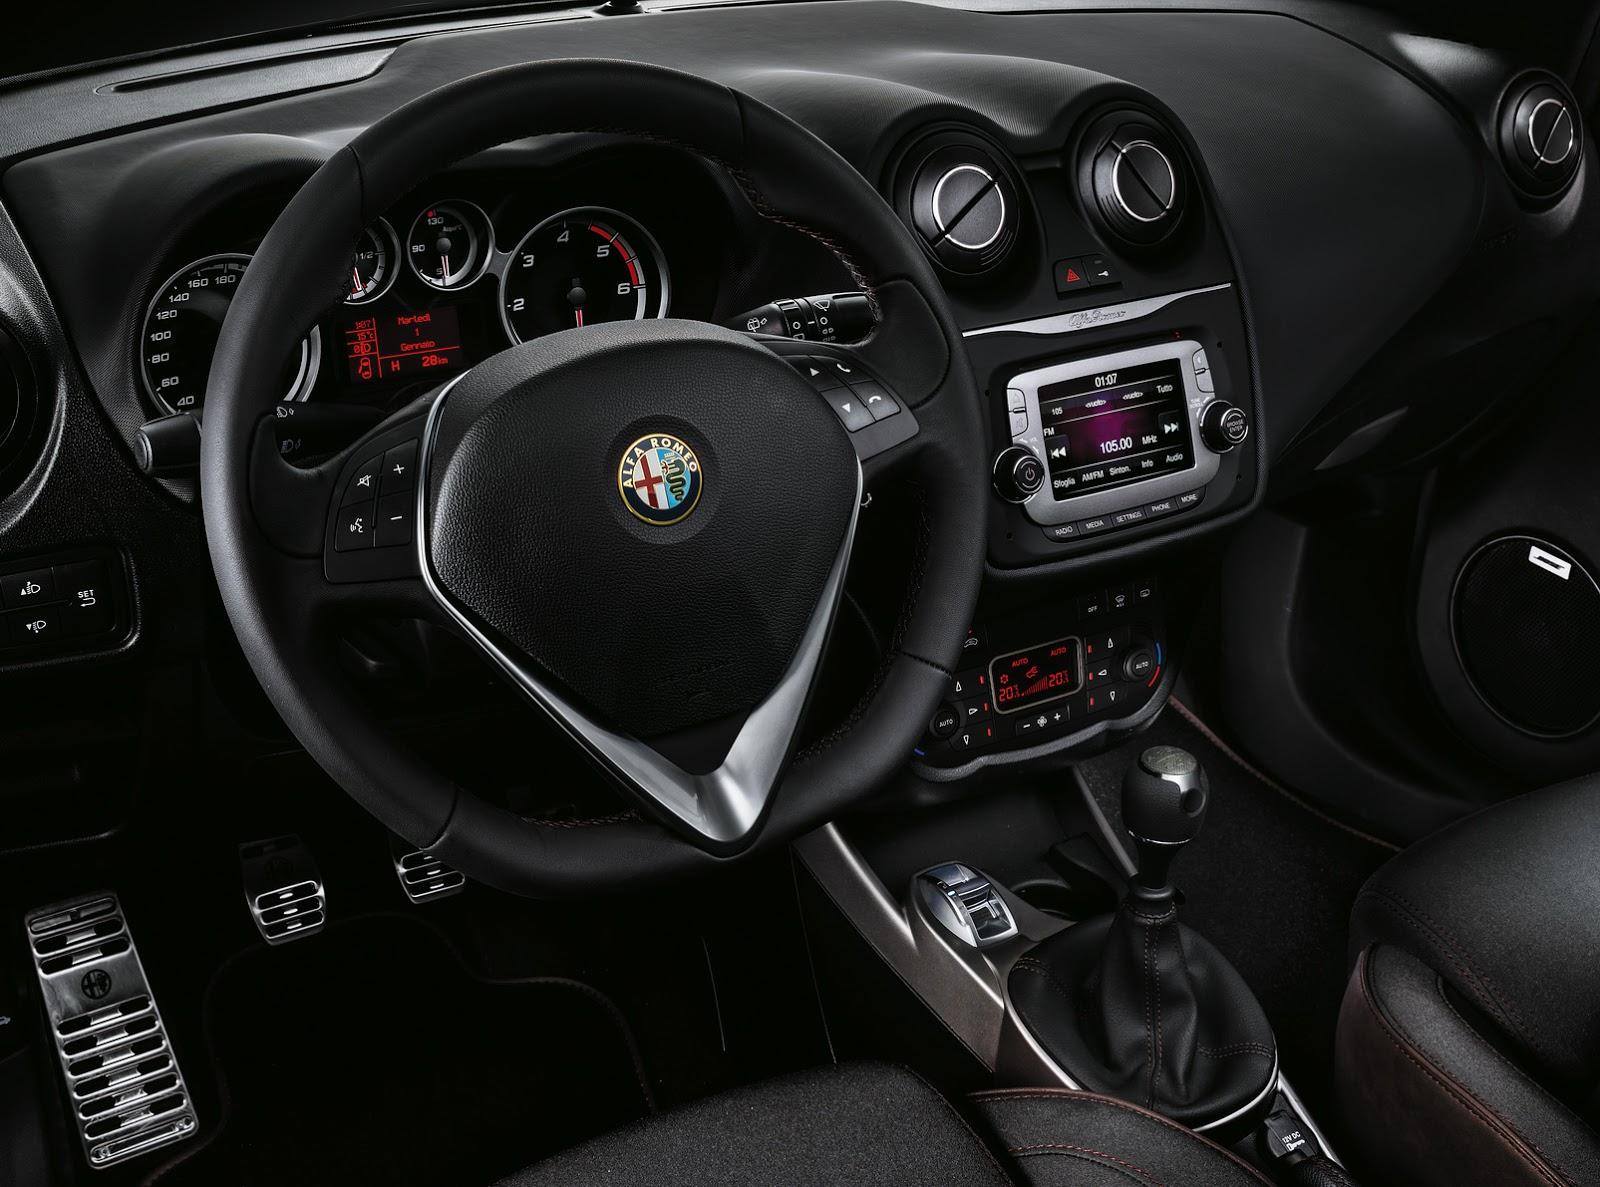 Alfa Romeo Mito Racer Is A Smart Dresser With No Muscle Photo Gallery likewise Alfa Romeo Mito Nero likewise Px Alfa Romeo Mito Speciale Twinair Cc as well Alfa Romeo Giulia Coupe Gta Junior together with Fa Eb E Alfa Romeo Mito. on alfa romeo mito 2018